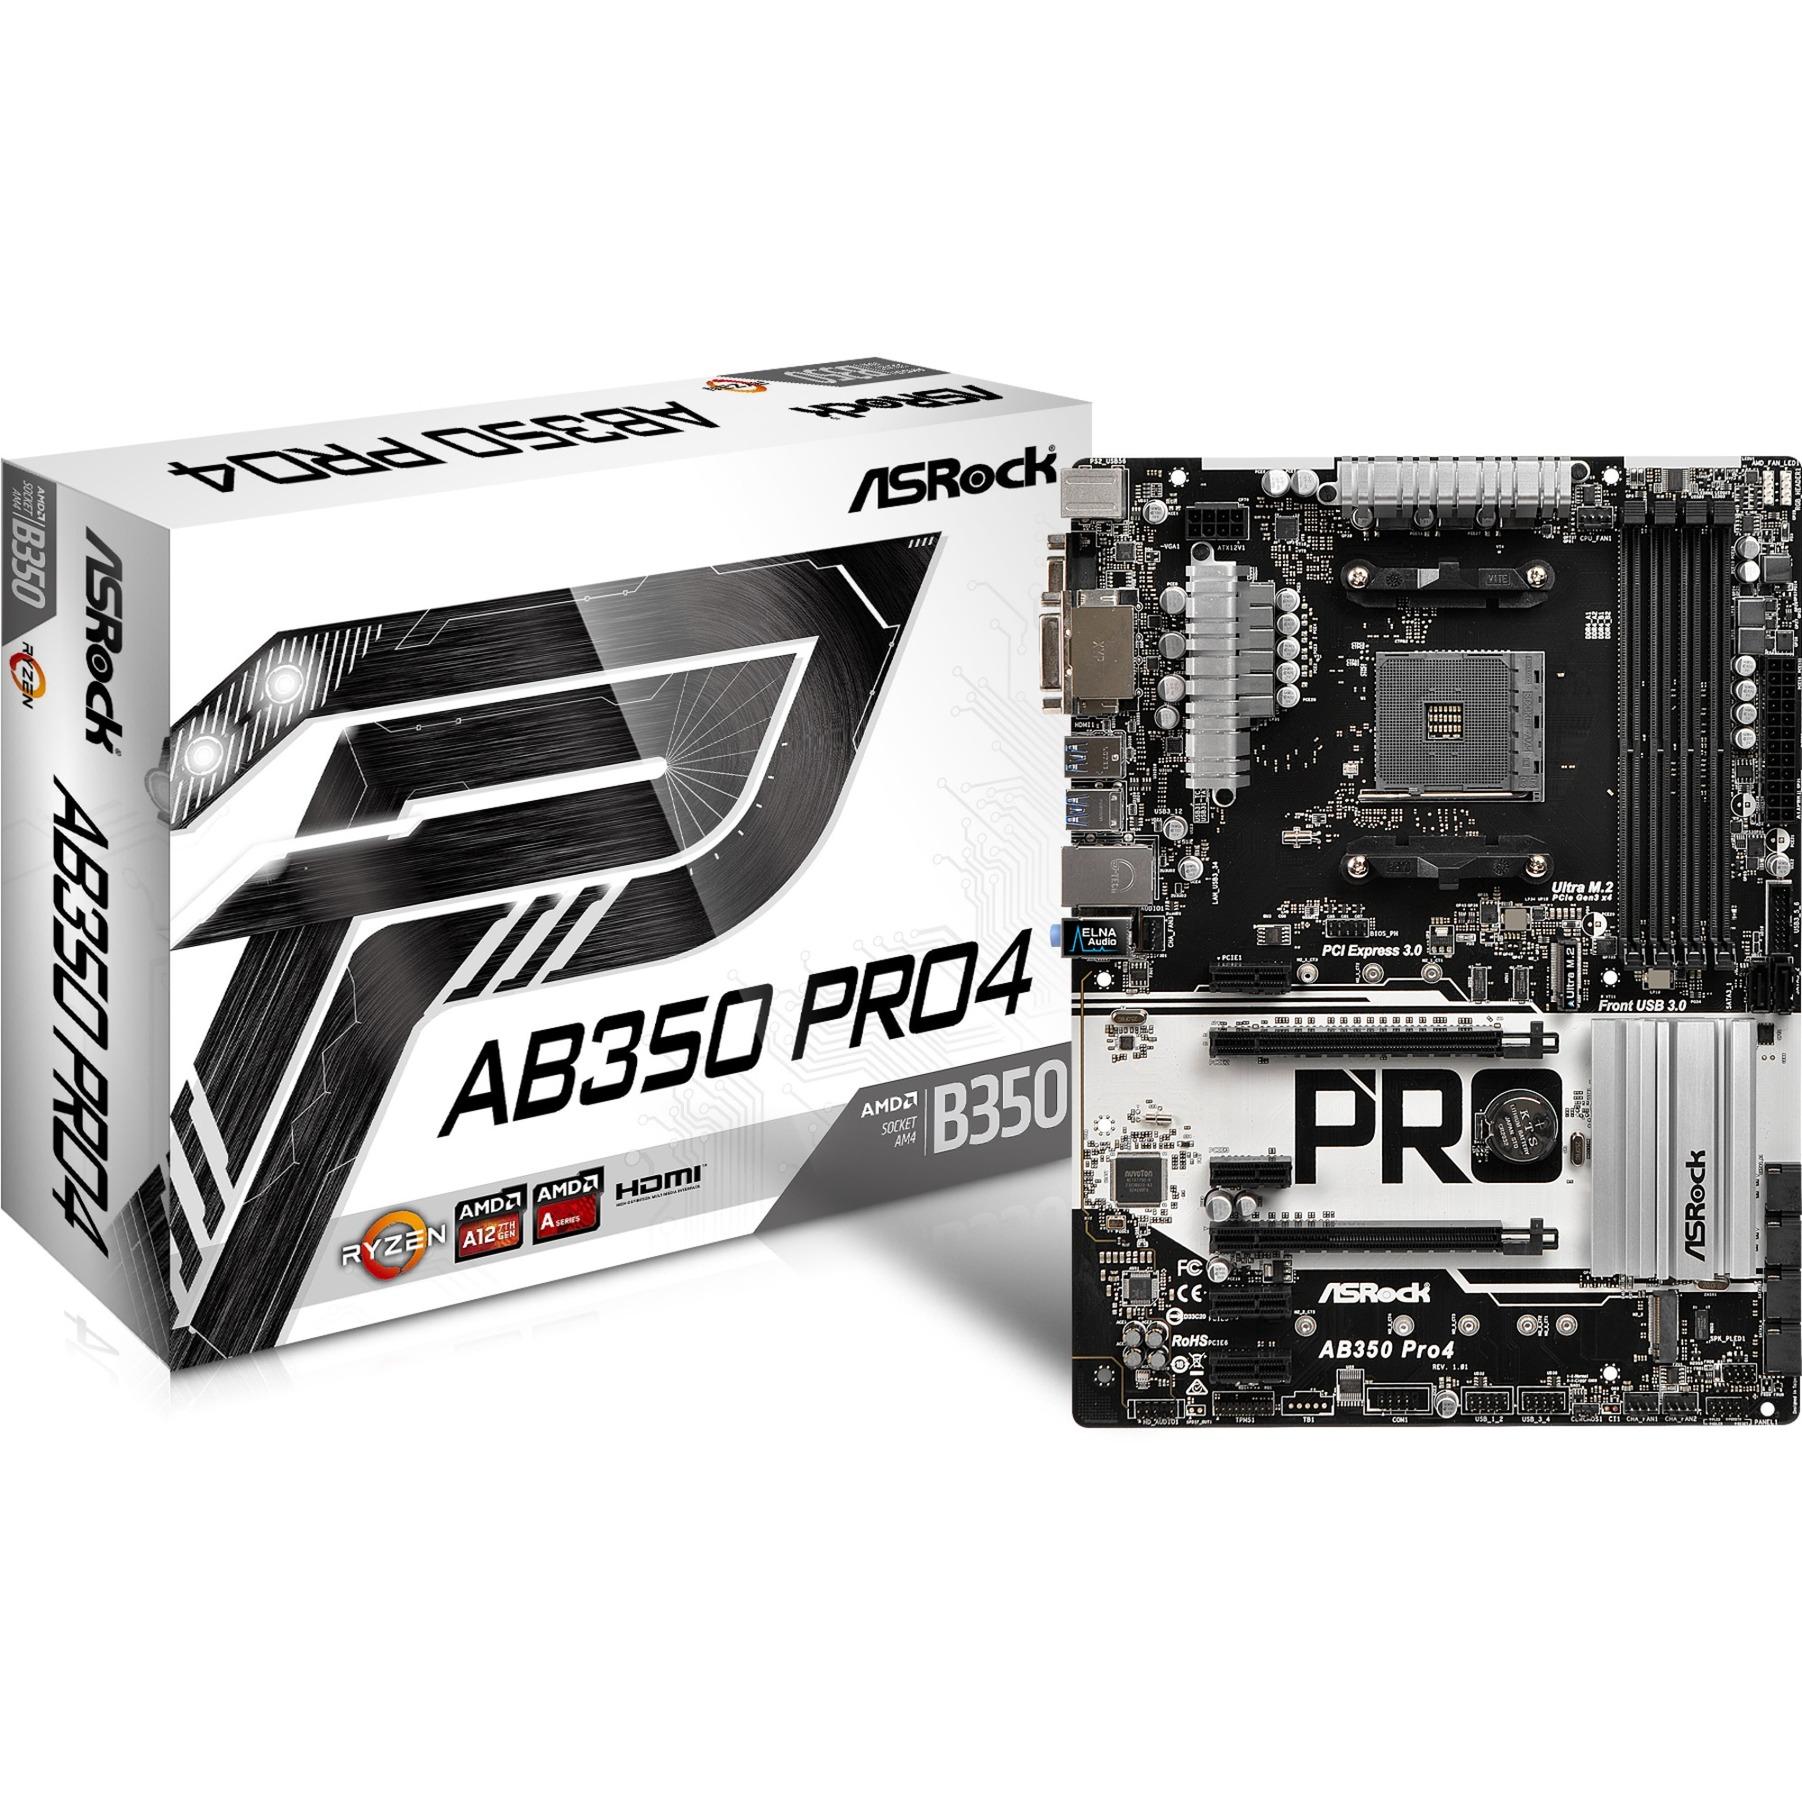 AB350 Pro4, Placa base